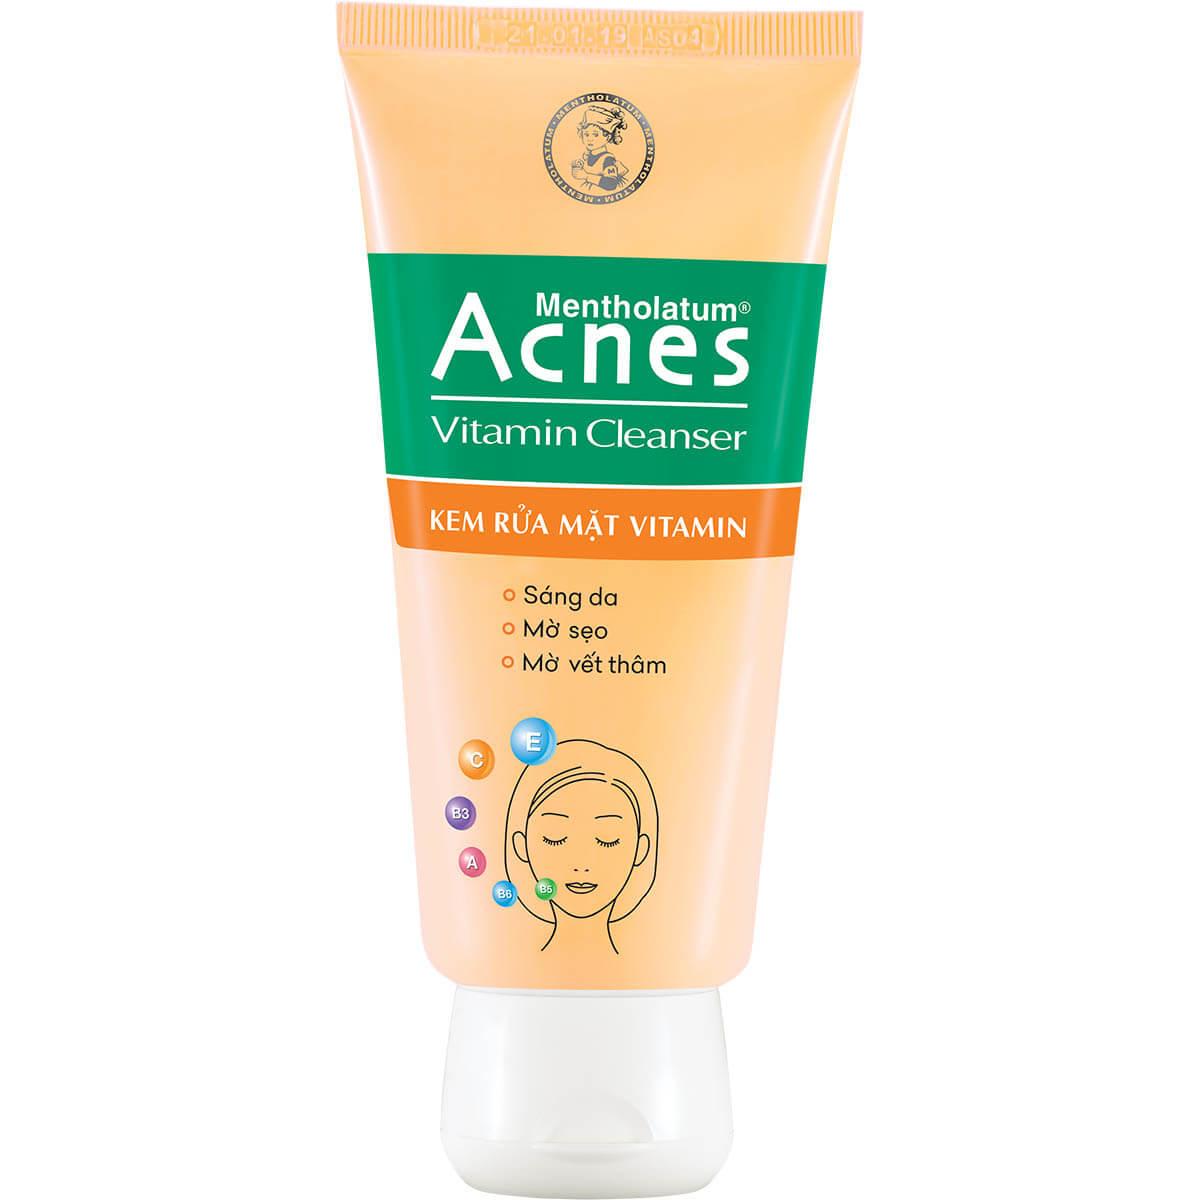 Acnes Vitamin Cleanser - Kem rửa mặt dưỡng da